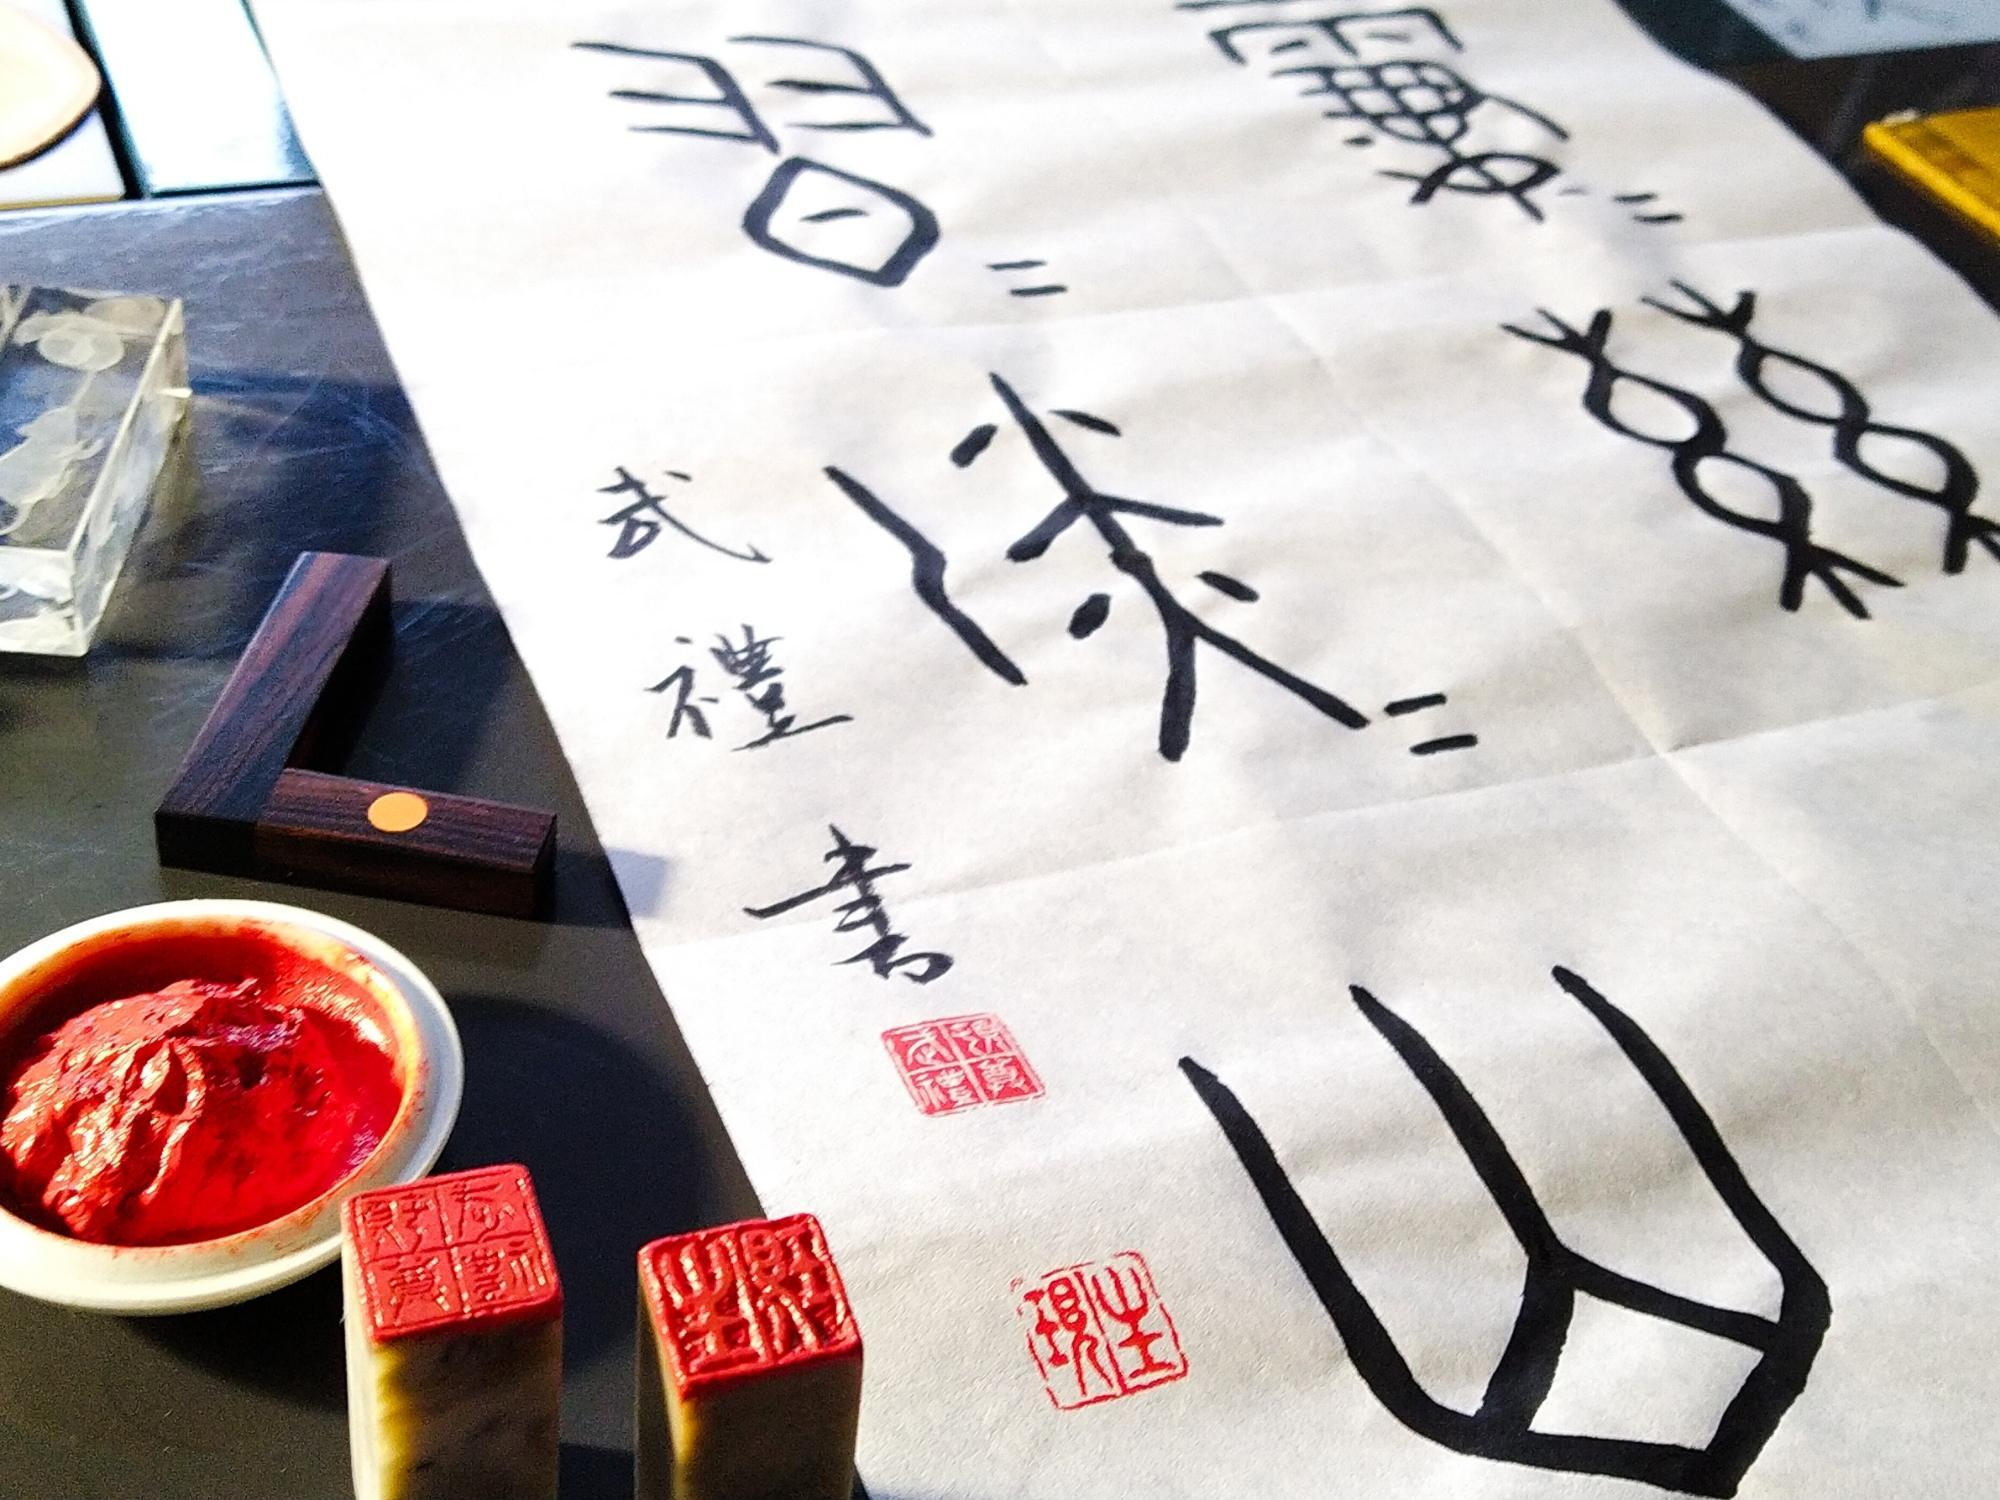 Japanese and Chinese Seal Engraving – Tenkoku